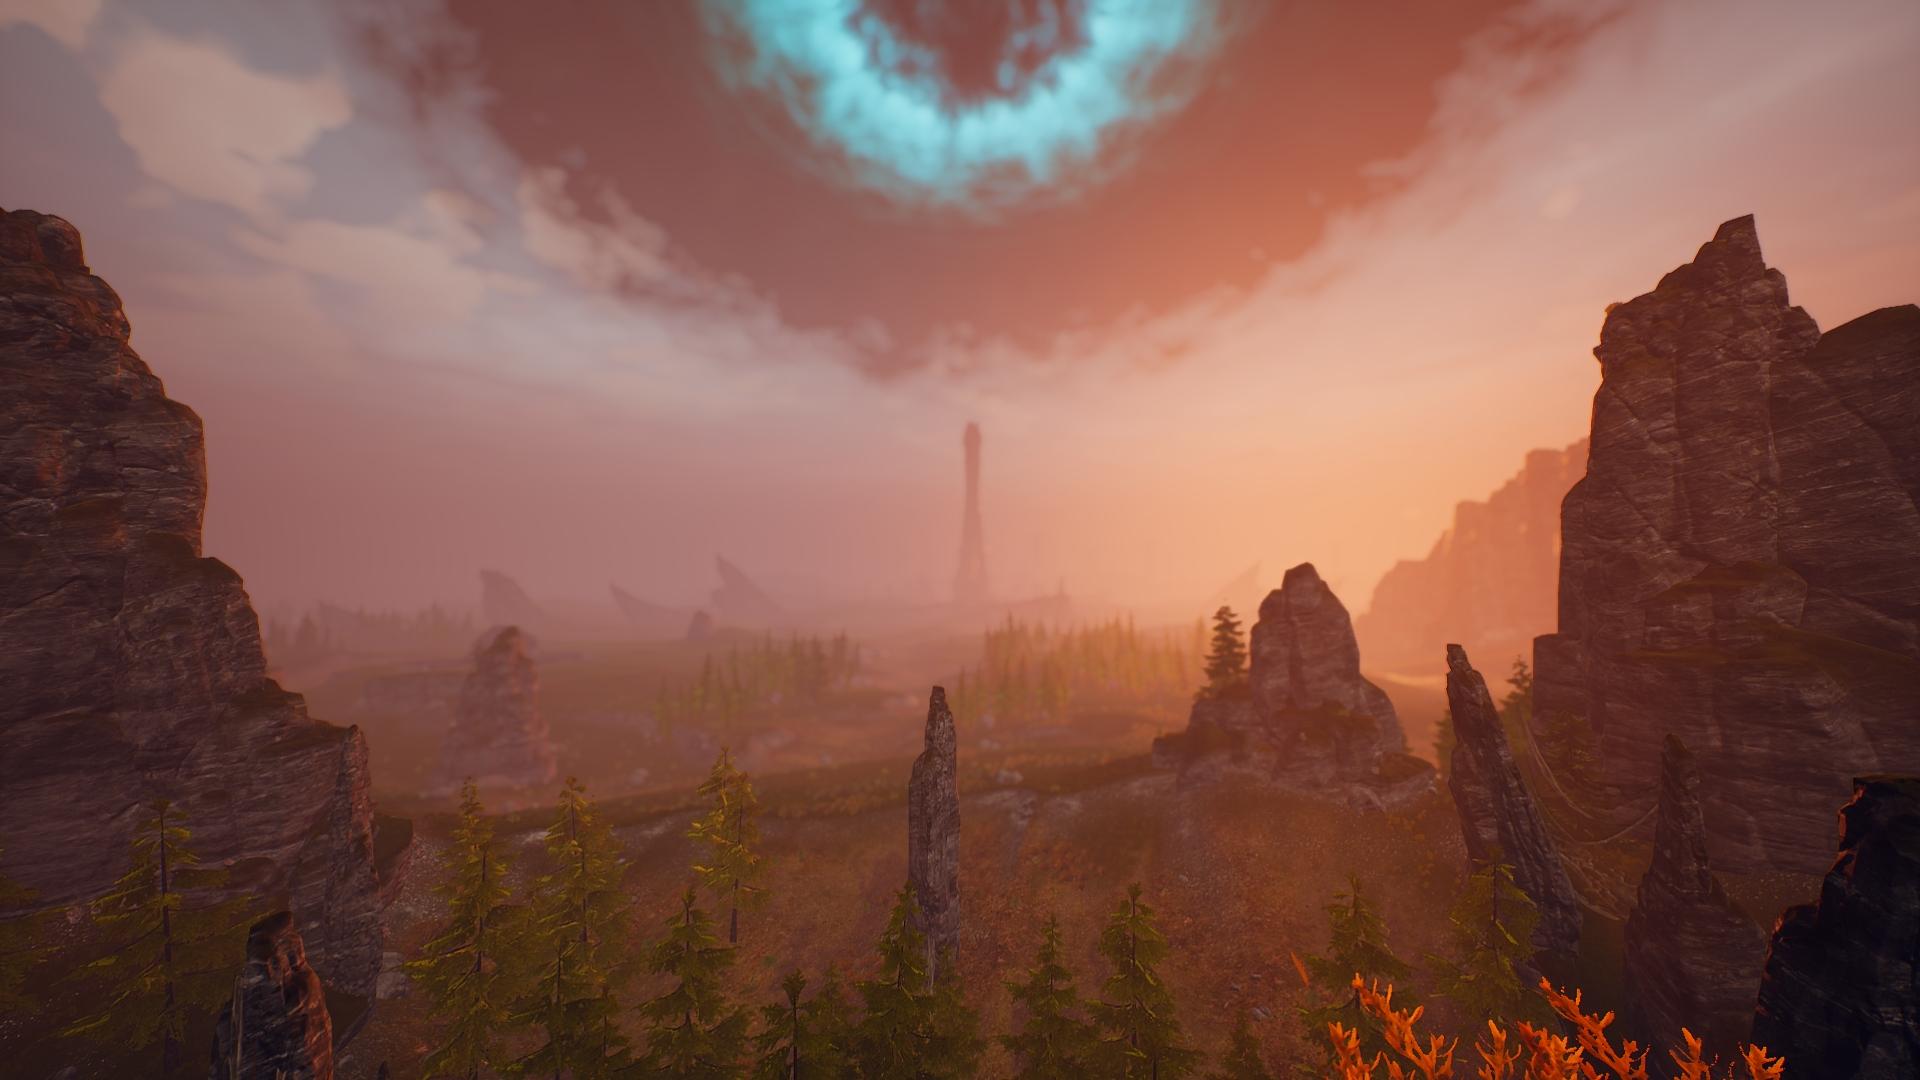 Conan Exiles Screenshot 2020.10.03 - 23.49.46.88.jpg